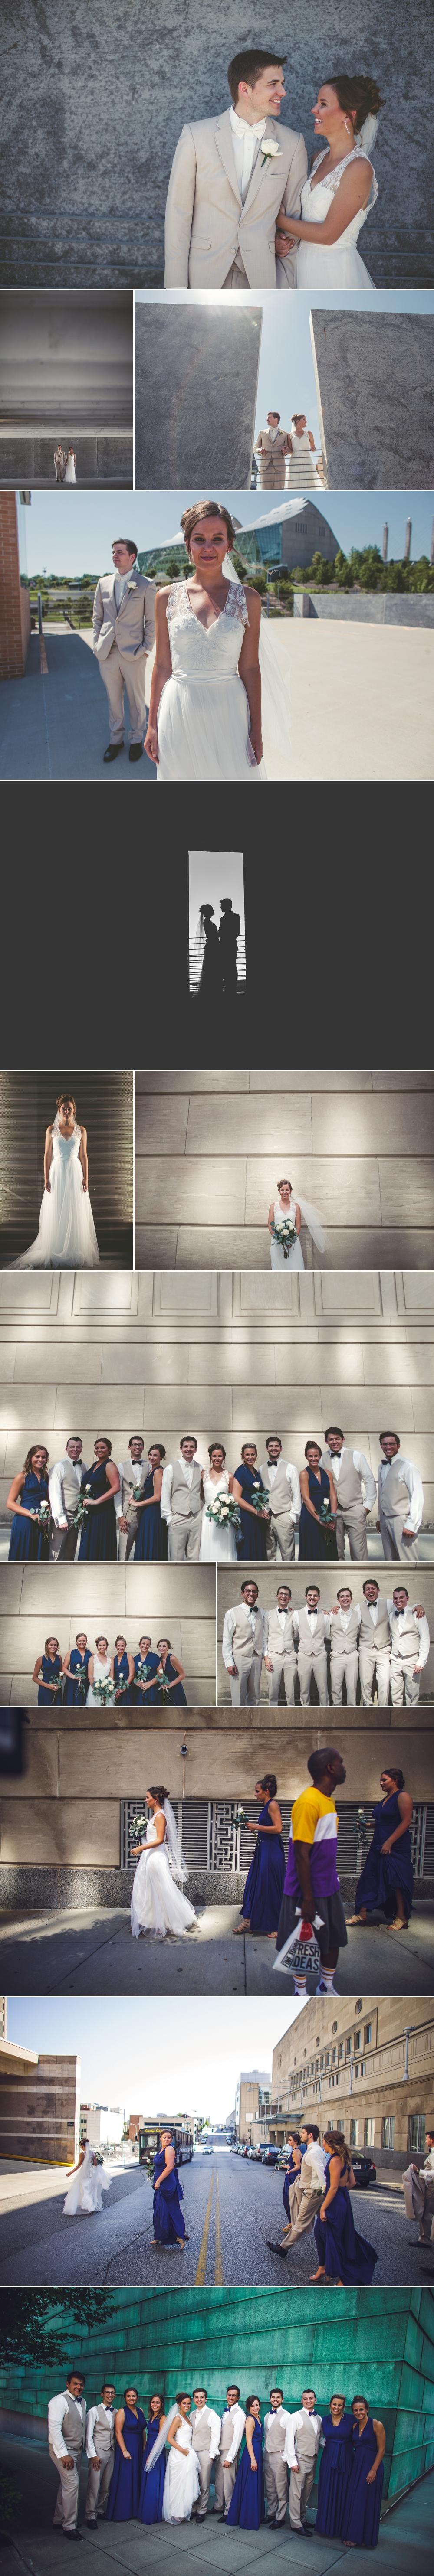 jason_domingues_photography_best_kansas_city_photographer_kc_weddings_bauer_0003.JPG